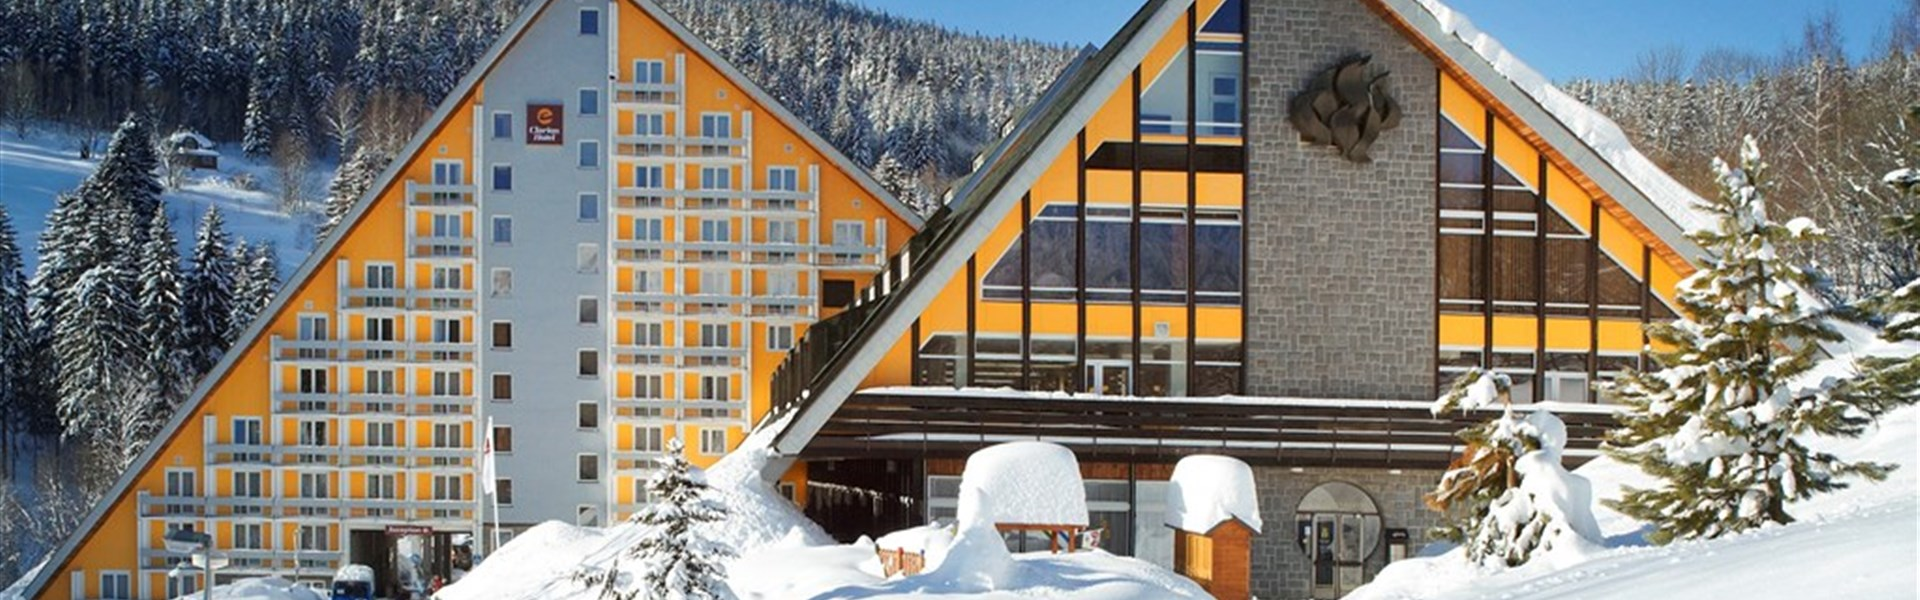 Marco Polo - Clarion Hotel Špindlerův Mlýn - zima -